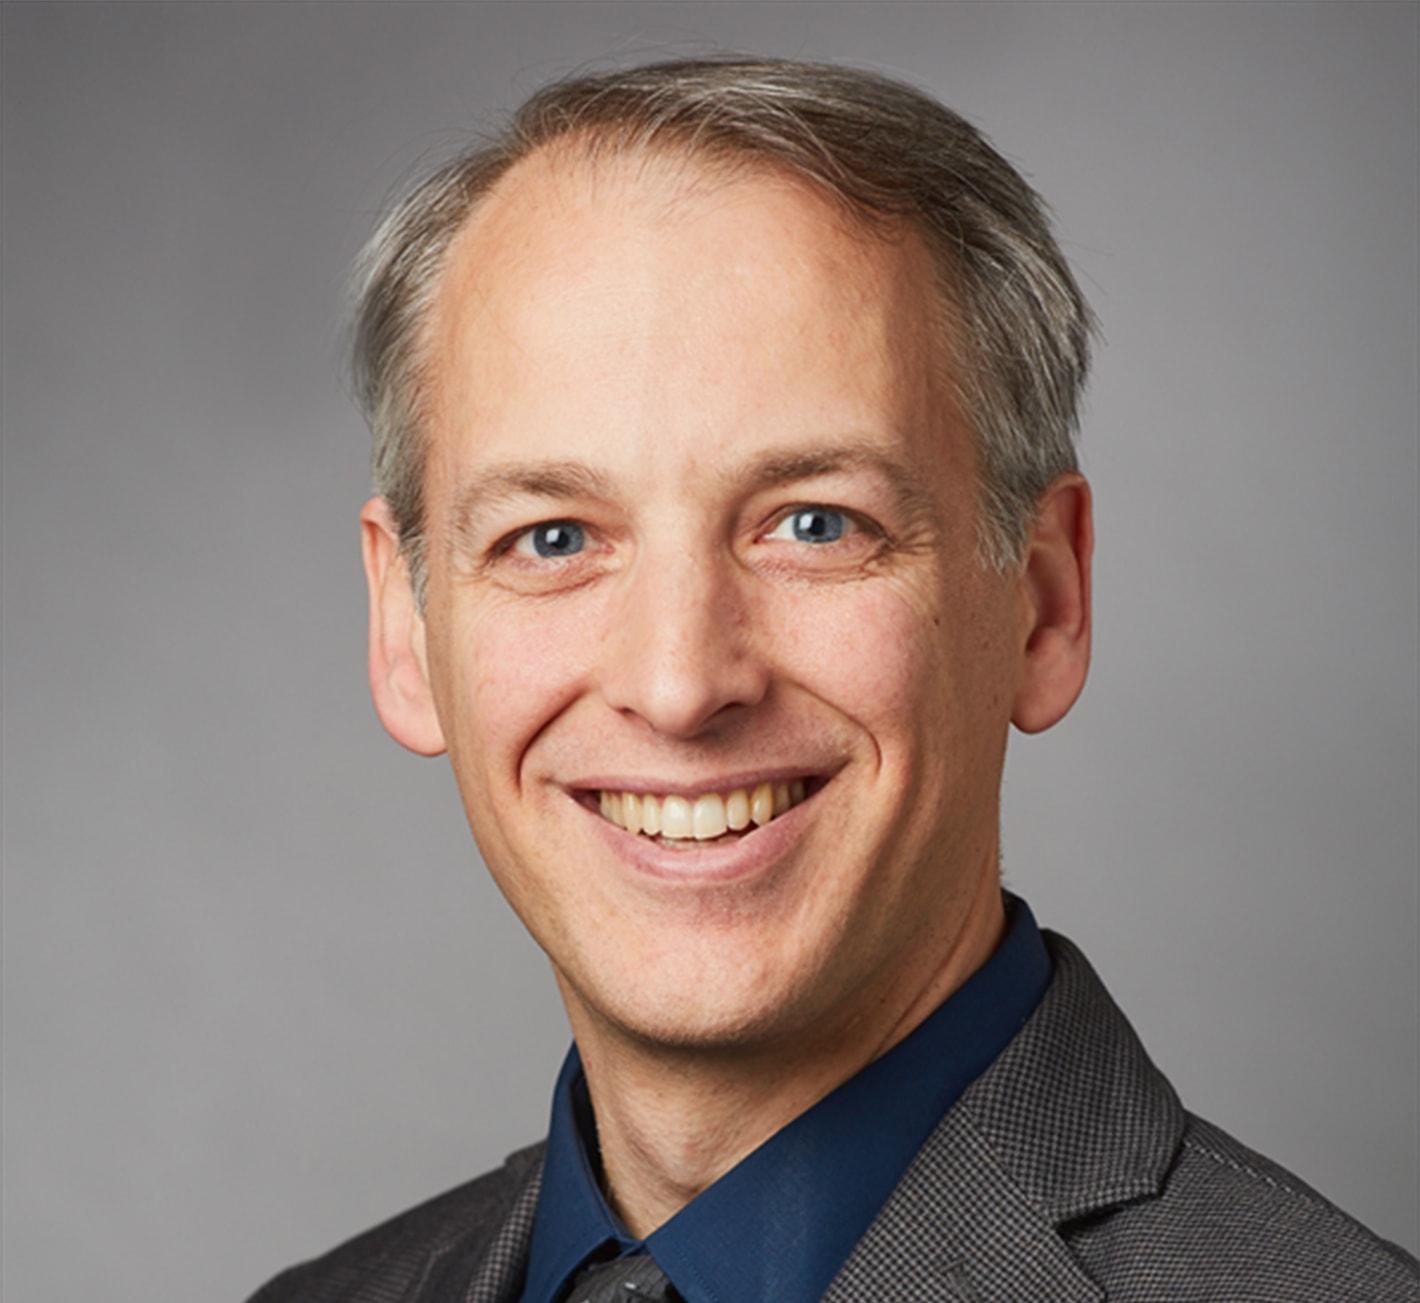 Jeffrey Townsend, Elihu Professor of Biostatistics and Professor of Ecology and Evolutionary Biology